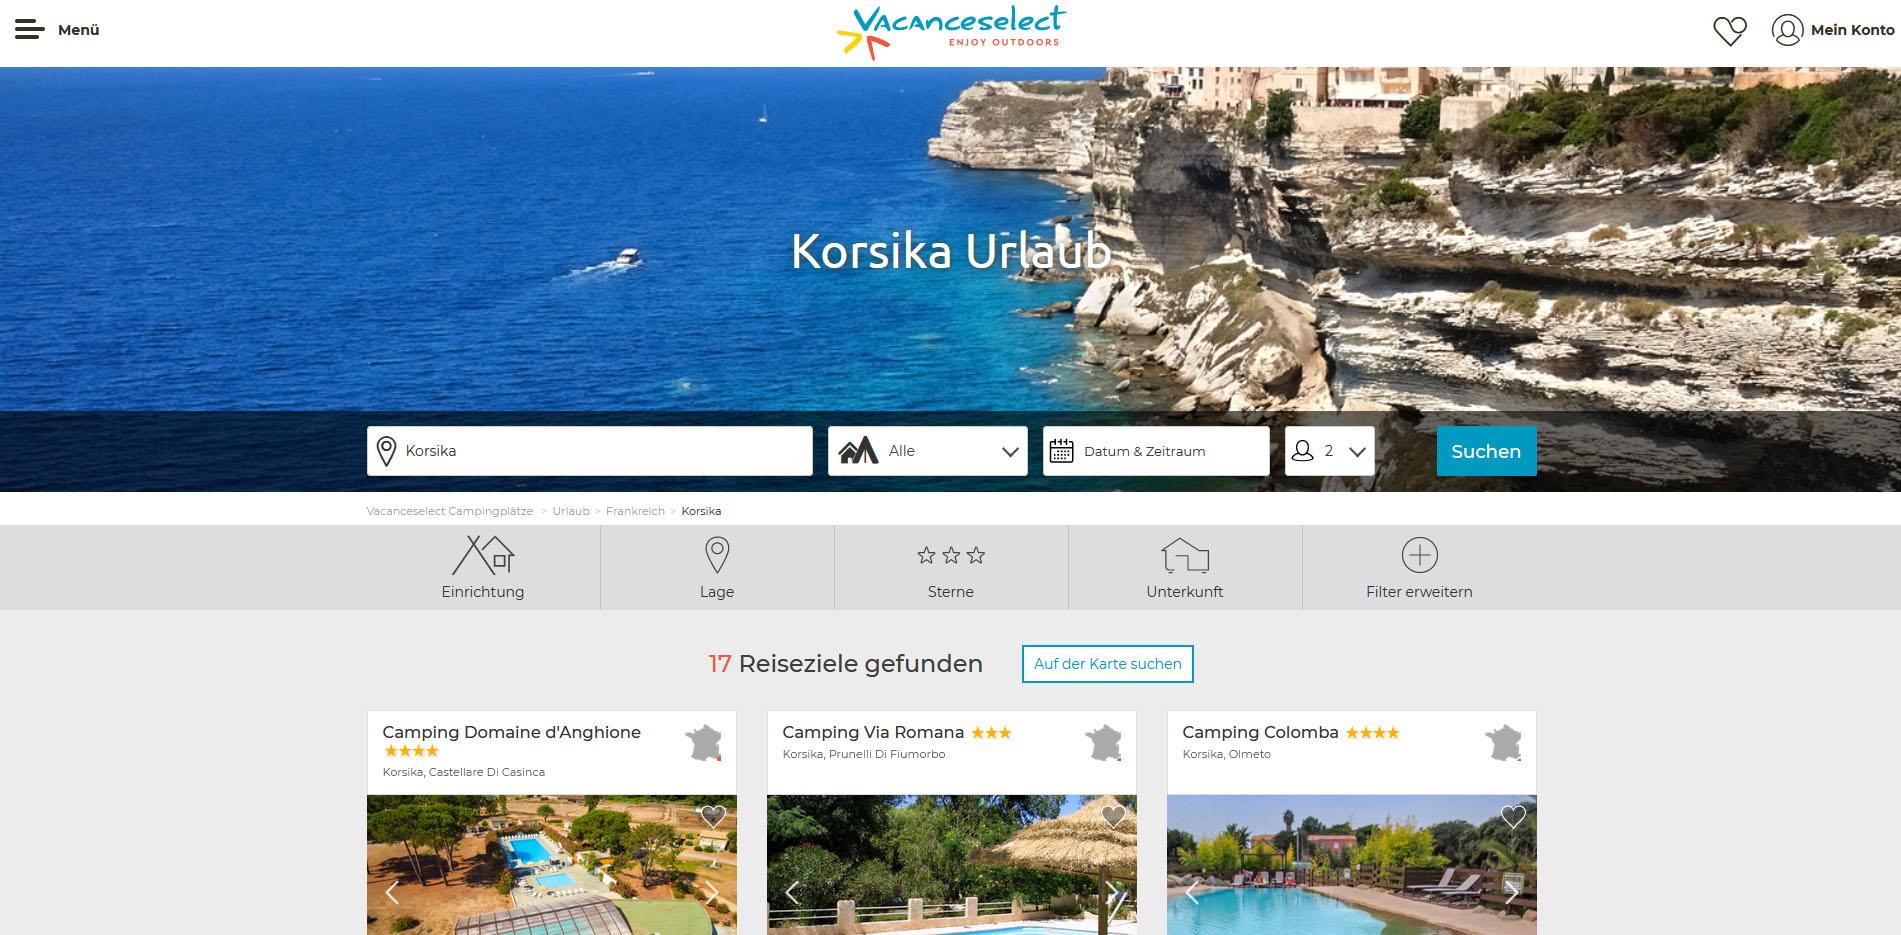 Vacanceselect Korsika Camping mit Niveau